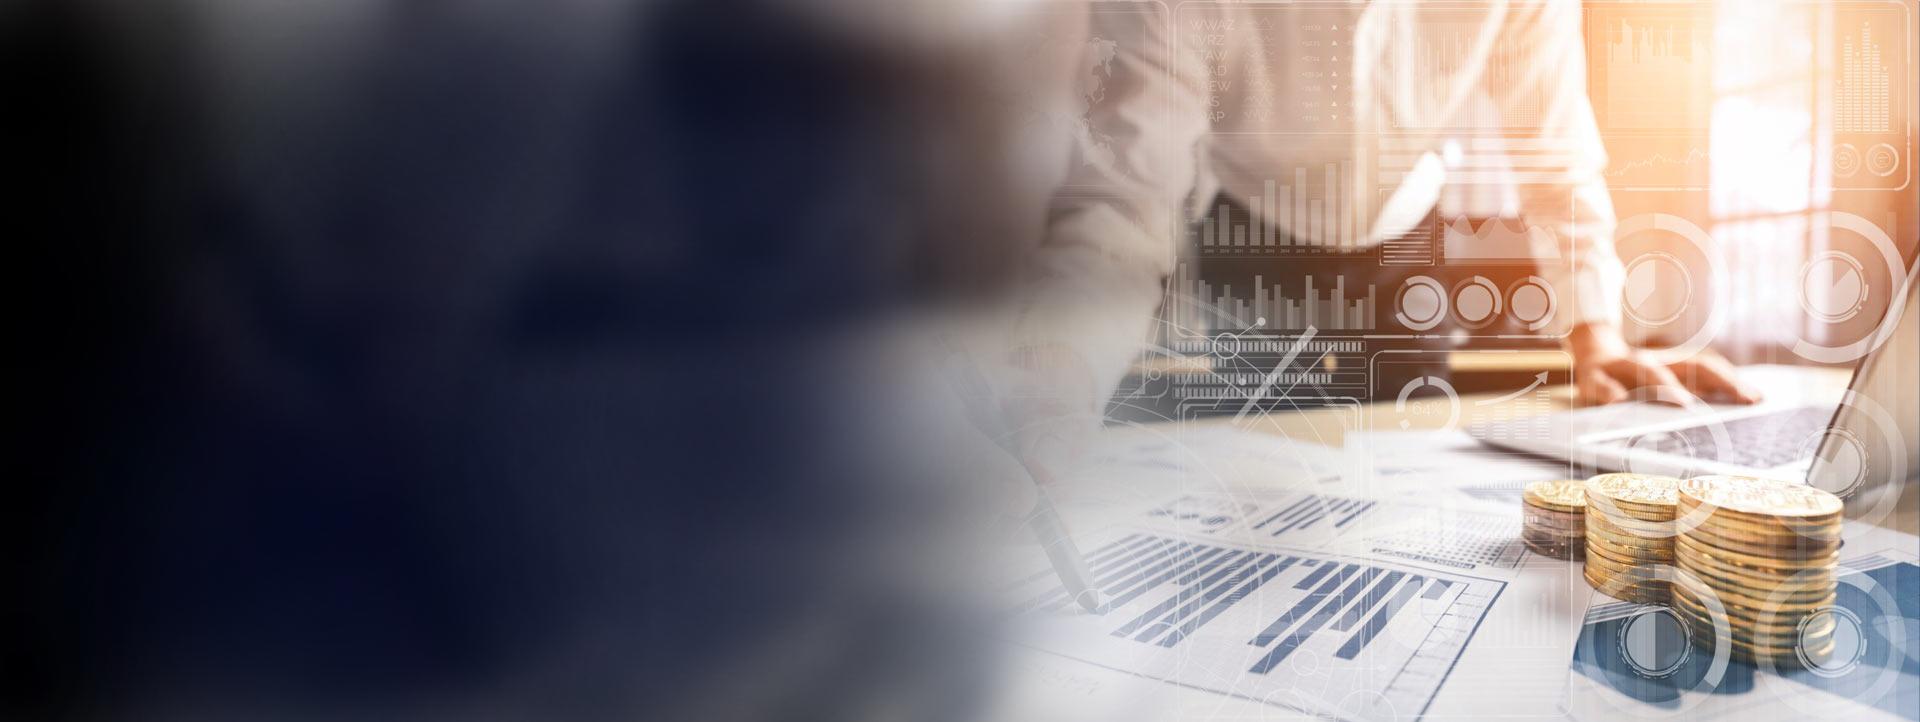 distance pgd financial management